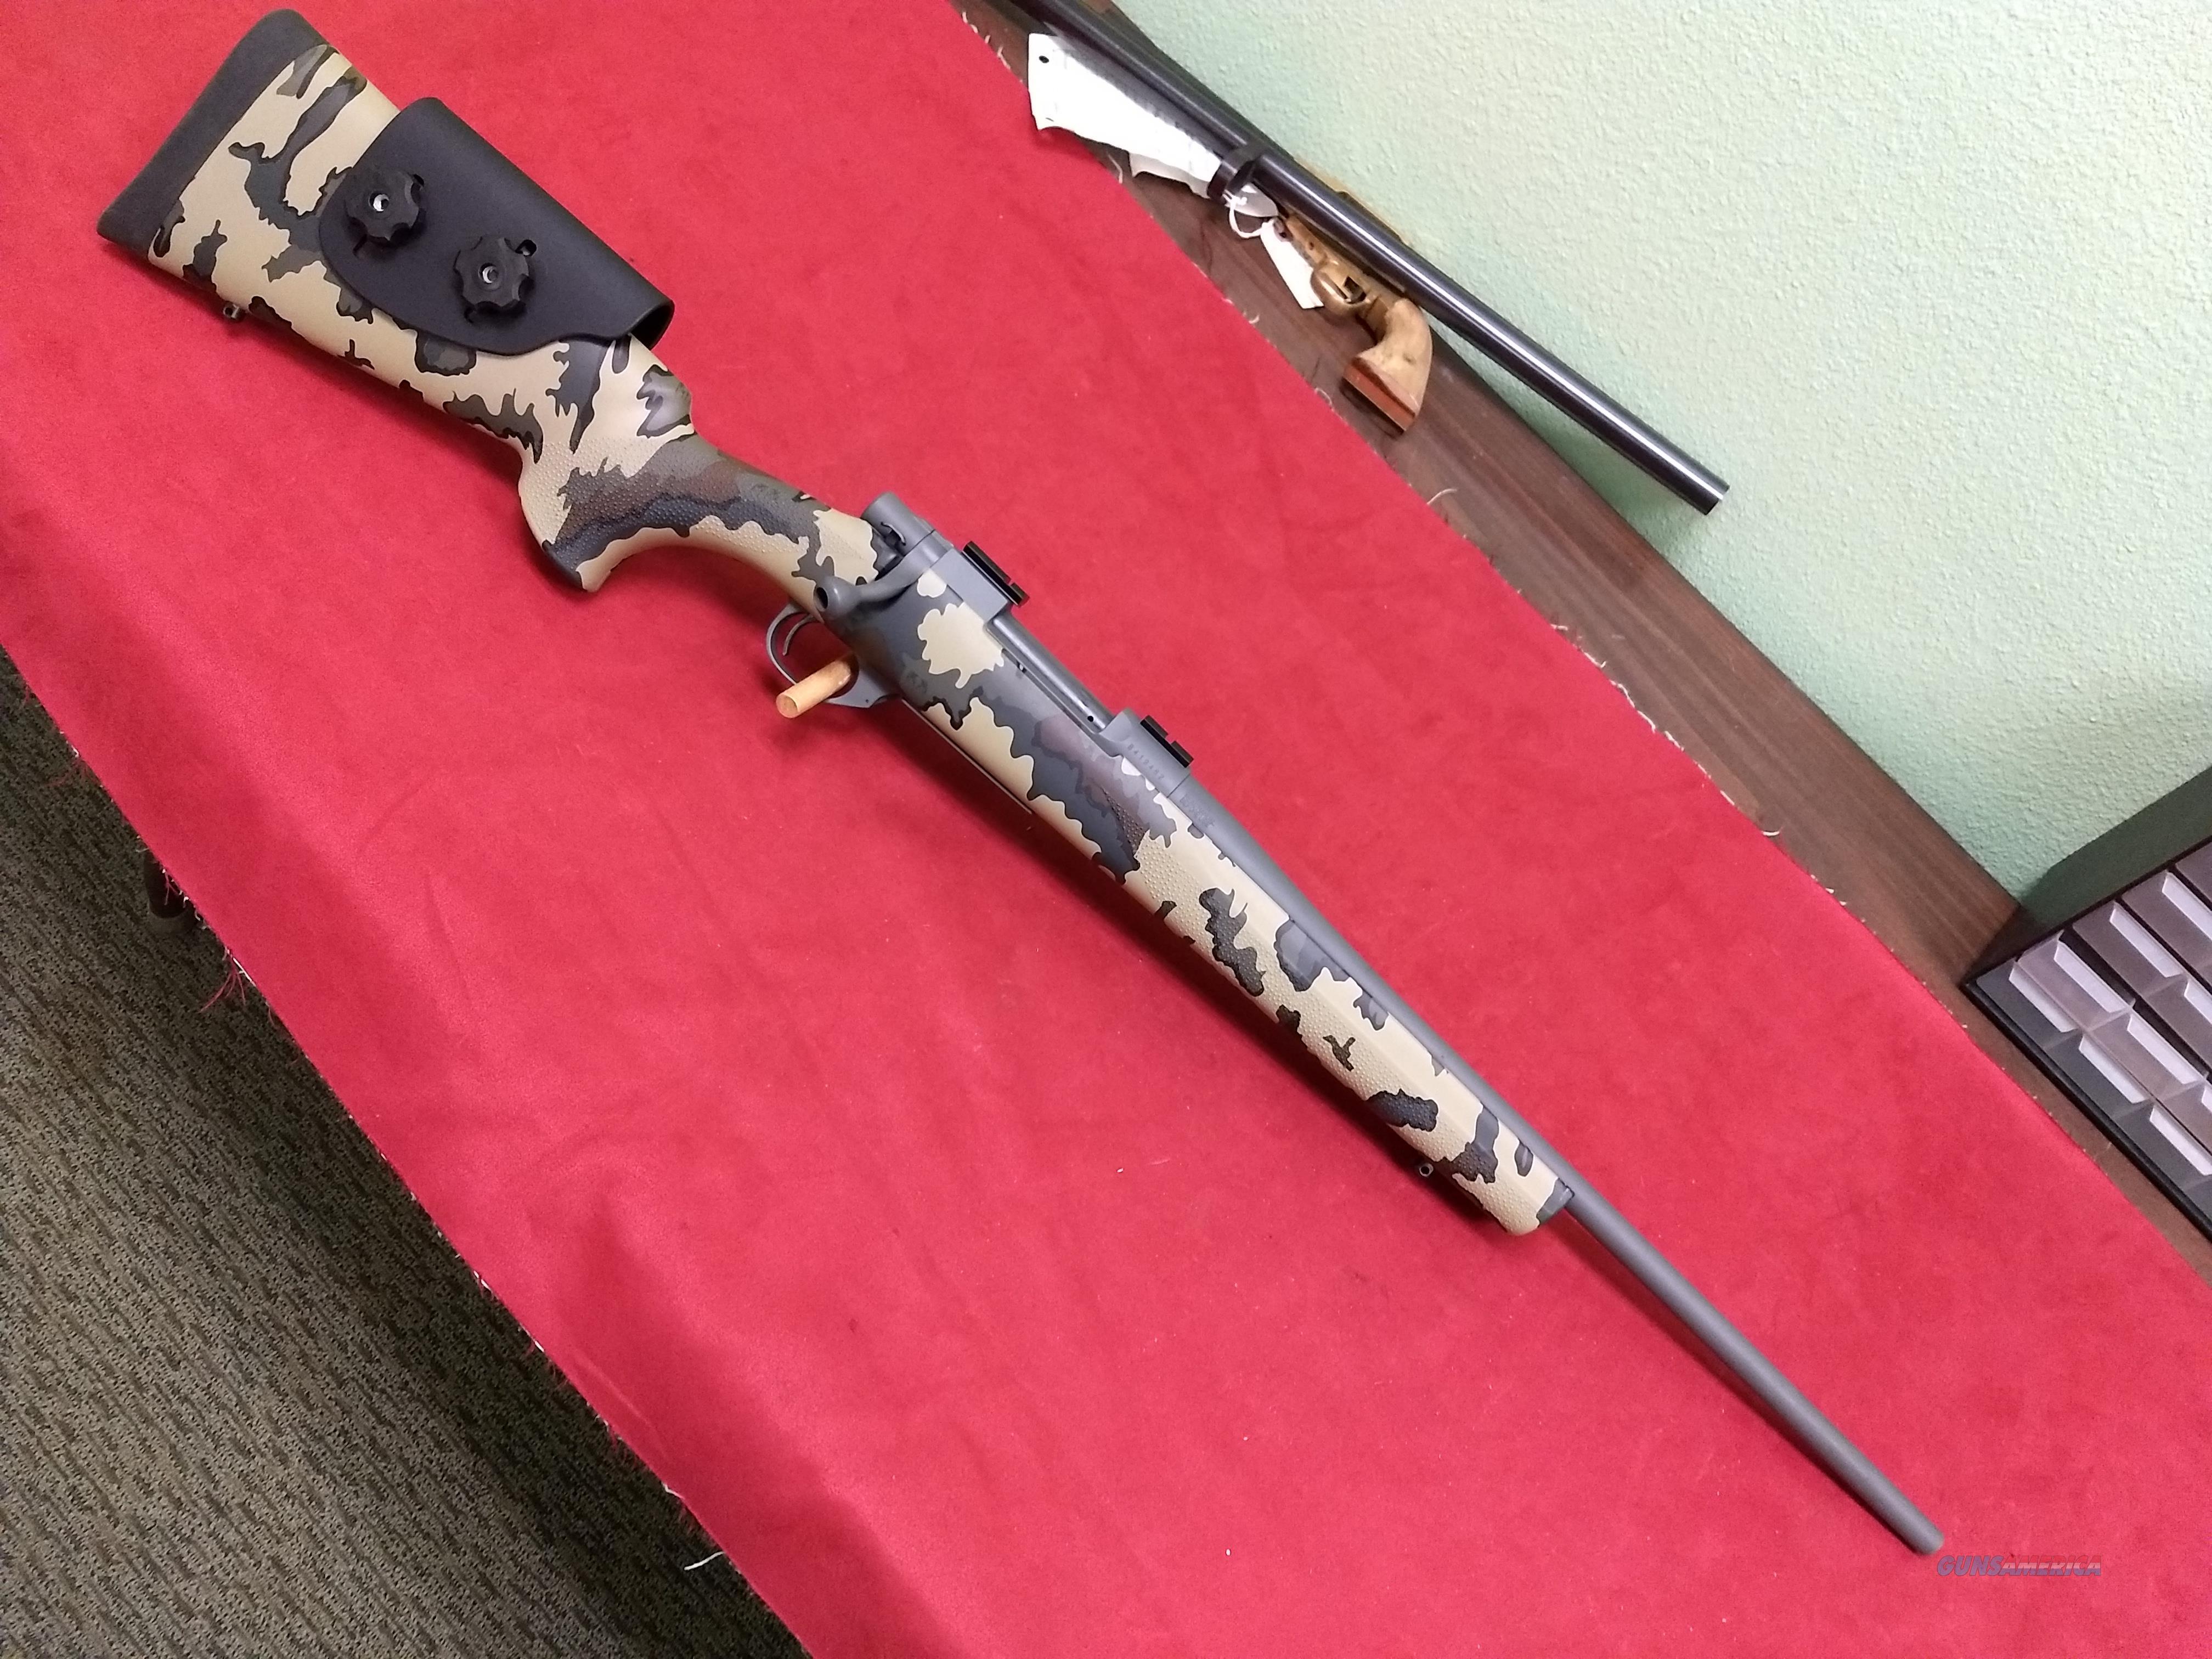 Howa 1500, .223 Rem, Hogue Stock, Weaver Bases  Guns > Rifles > Howa Rifles